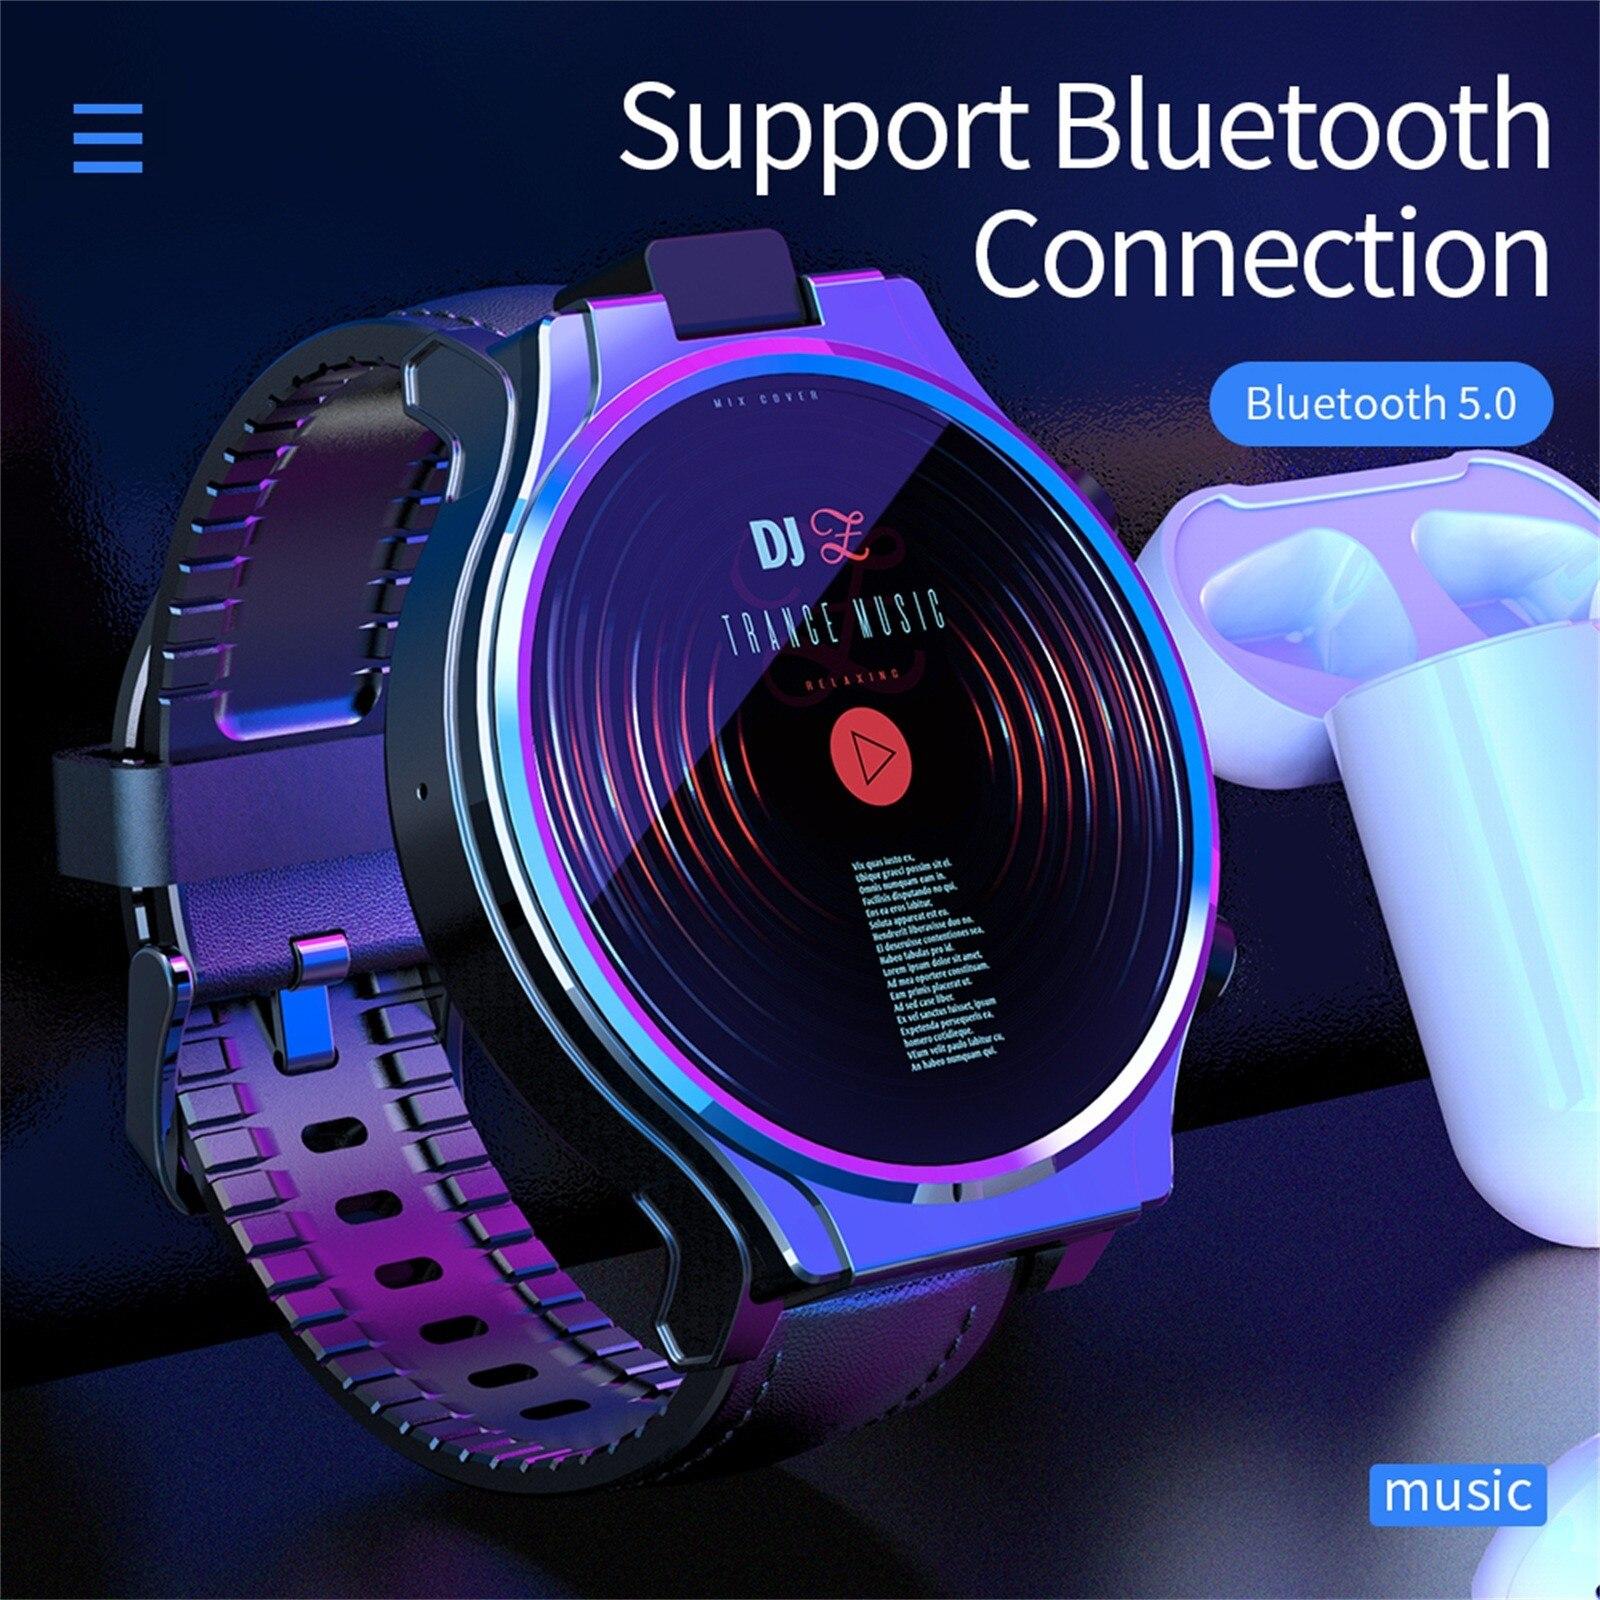 Promo Appllp Pro 4g Smart Watch Men Wifi Gps Watches 4gb 64gb Android 10.0 Watch Phone Unisex Men Women Multifunction Wristband